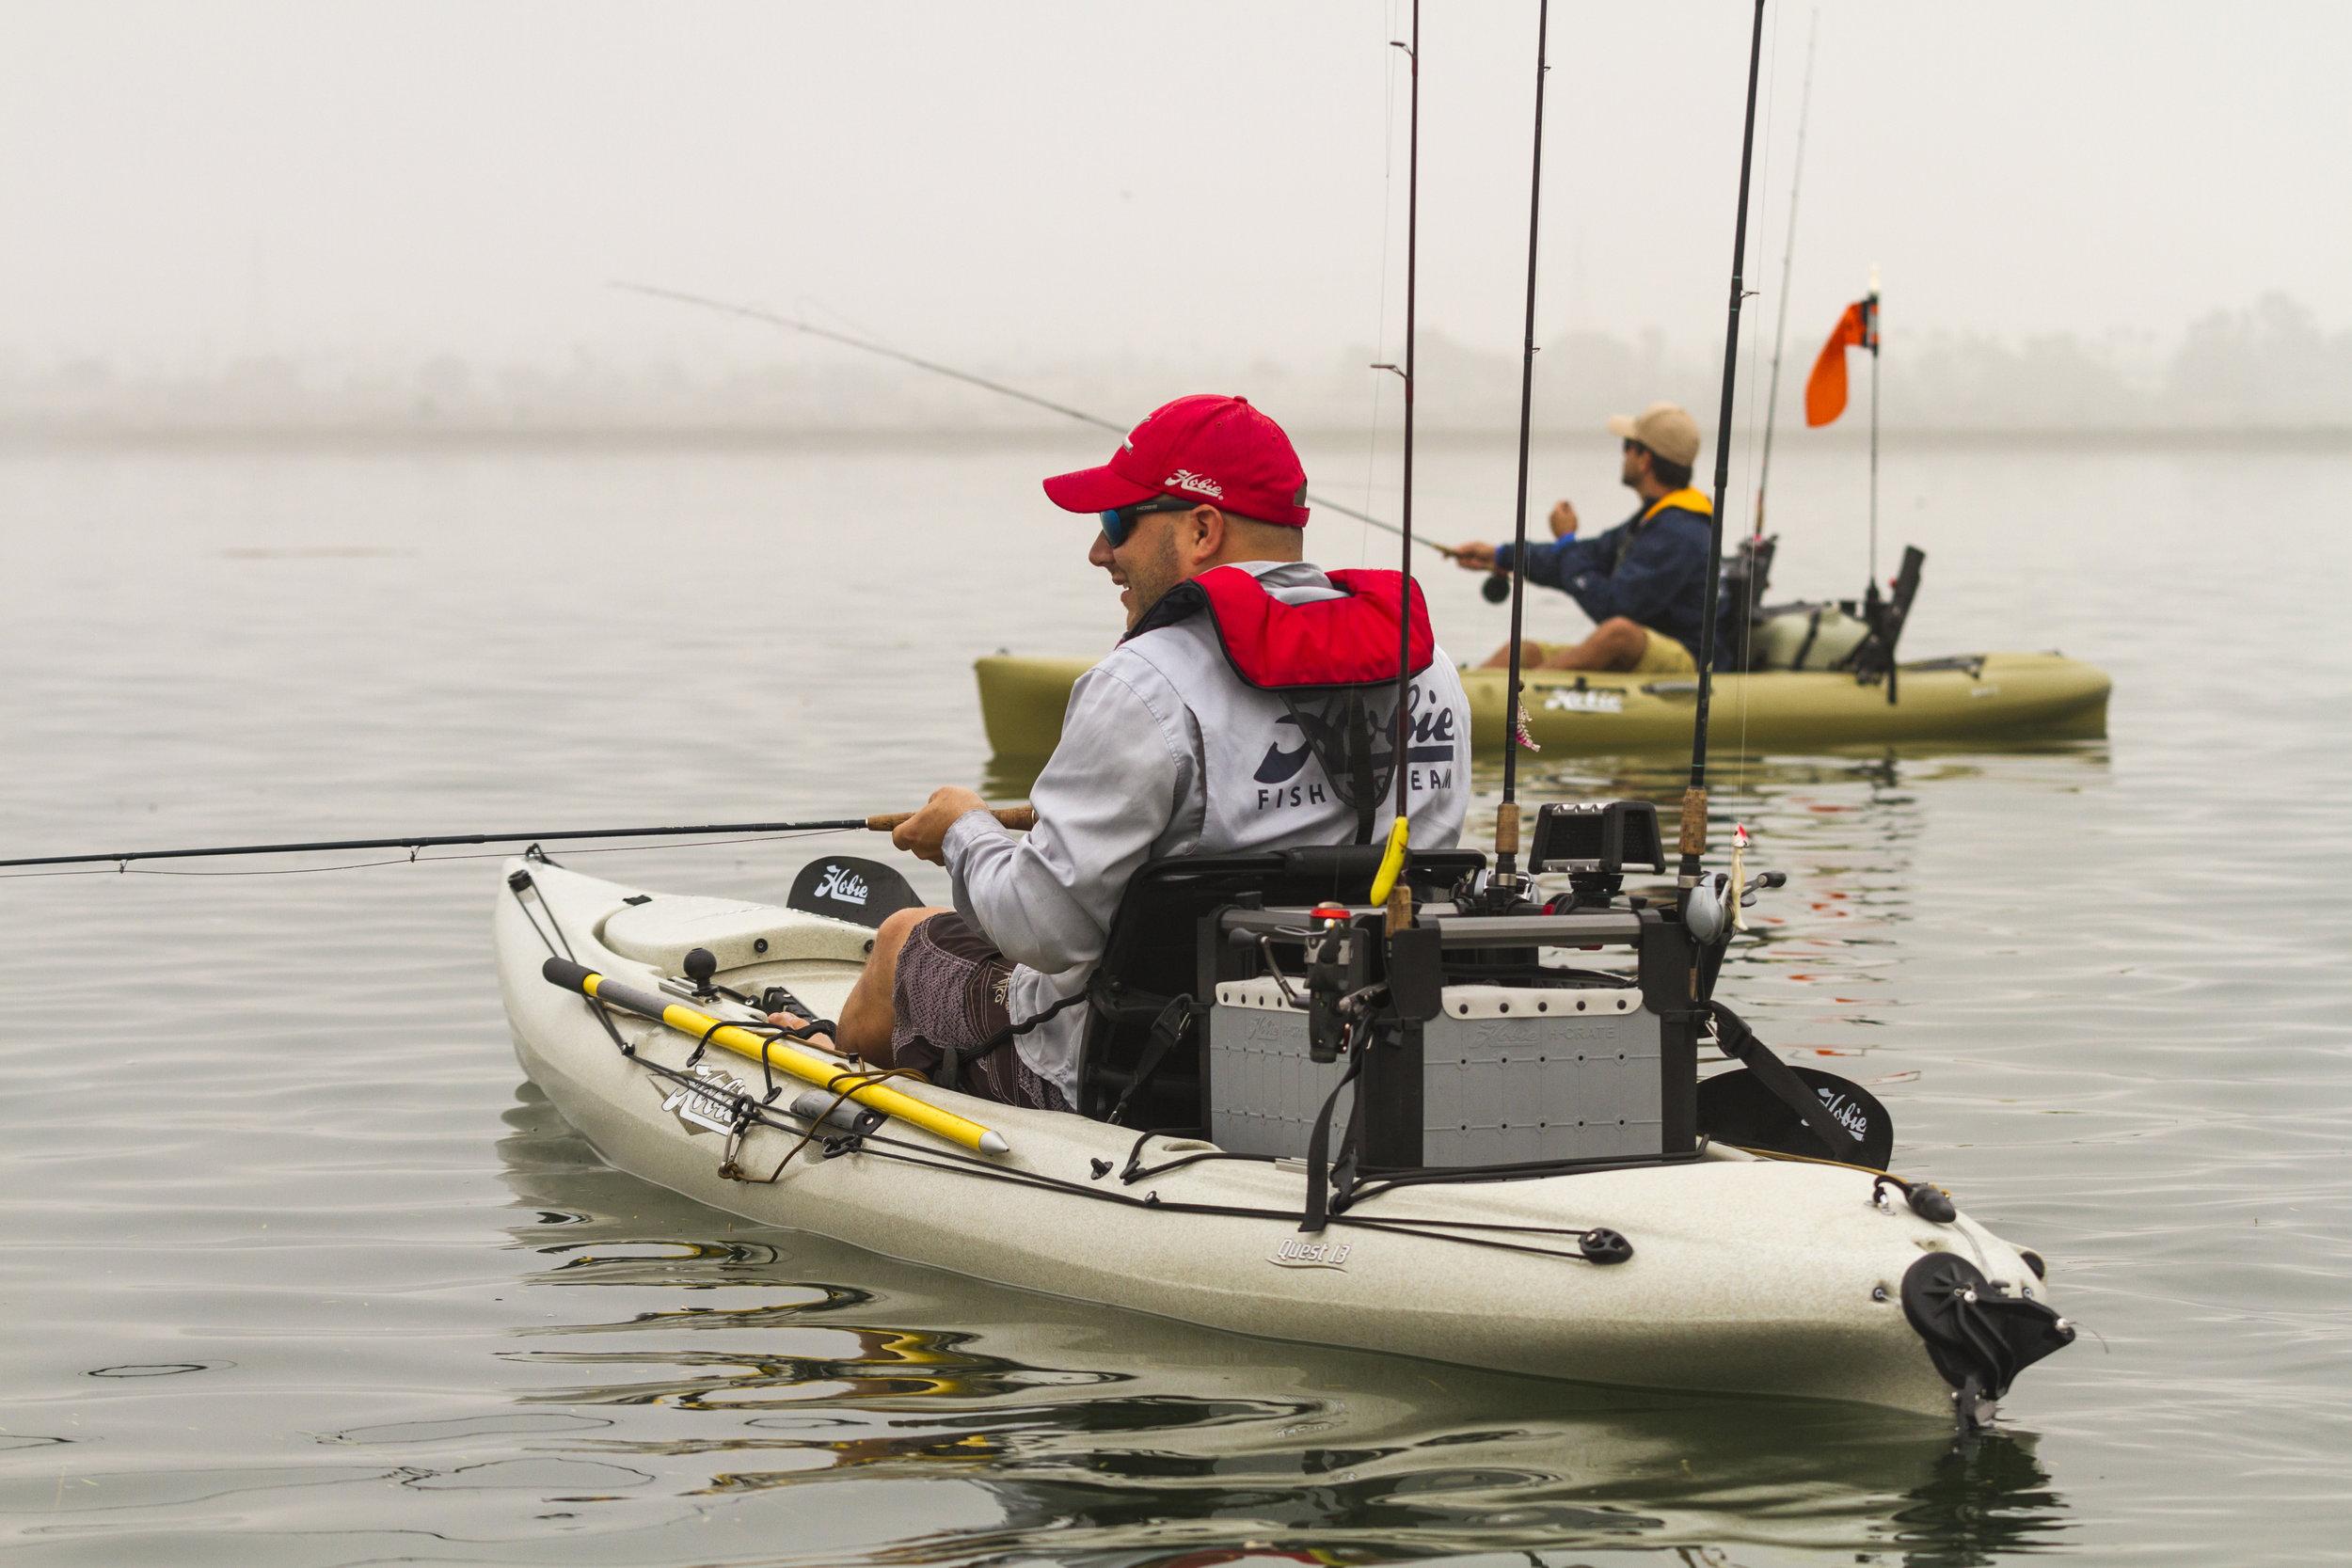 Quest13_fishing_foggy_Shane_smiles_9017_full.jpg